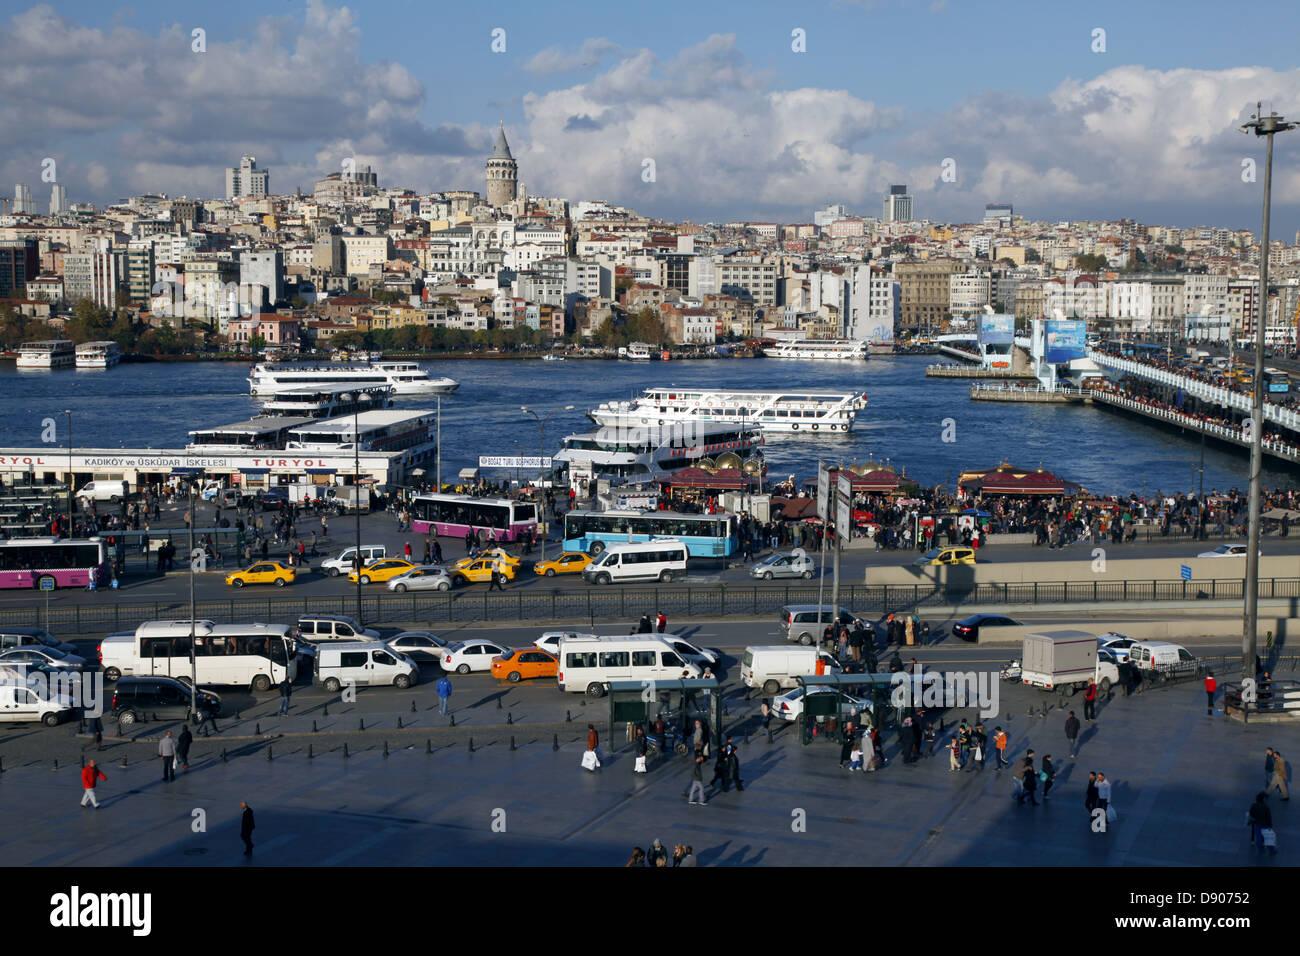 GOLDEN HORN & GALATA TOWER BEYOGLU ISTANBUL TURKEY 11 November 2012 - Stock Image